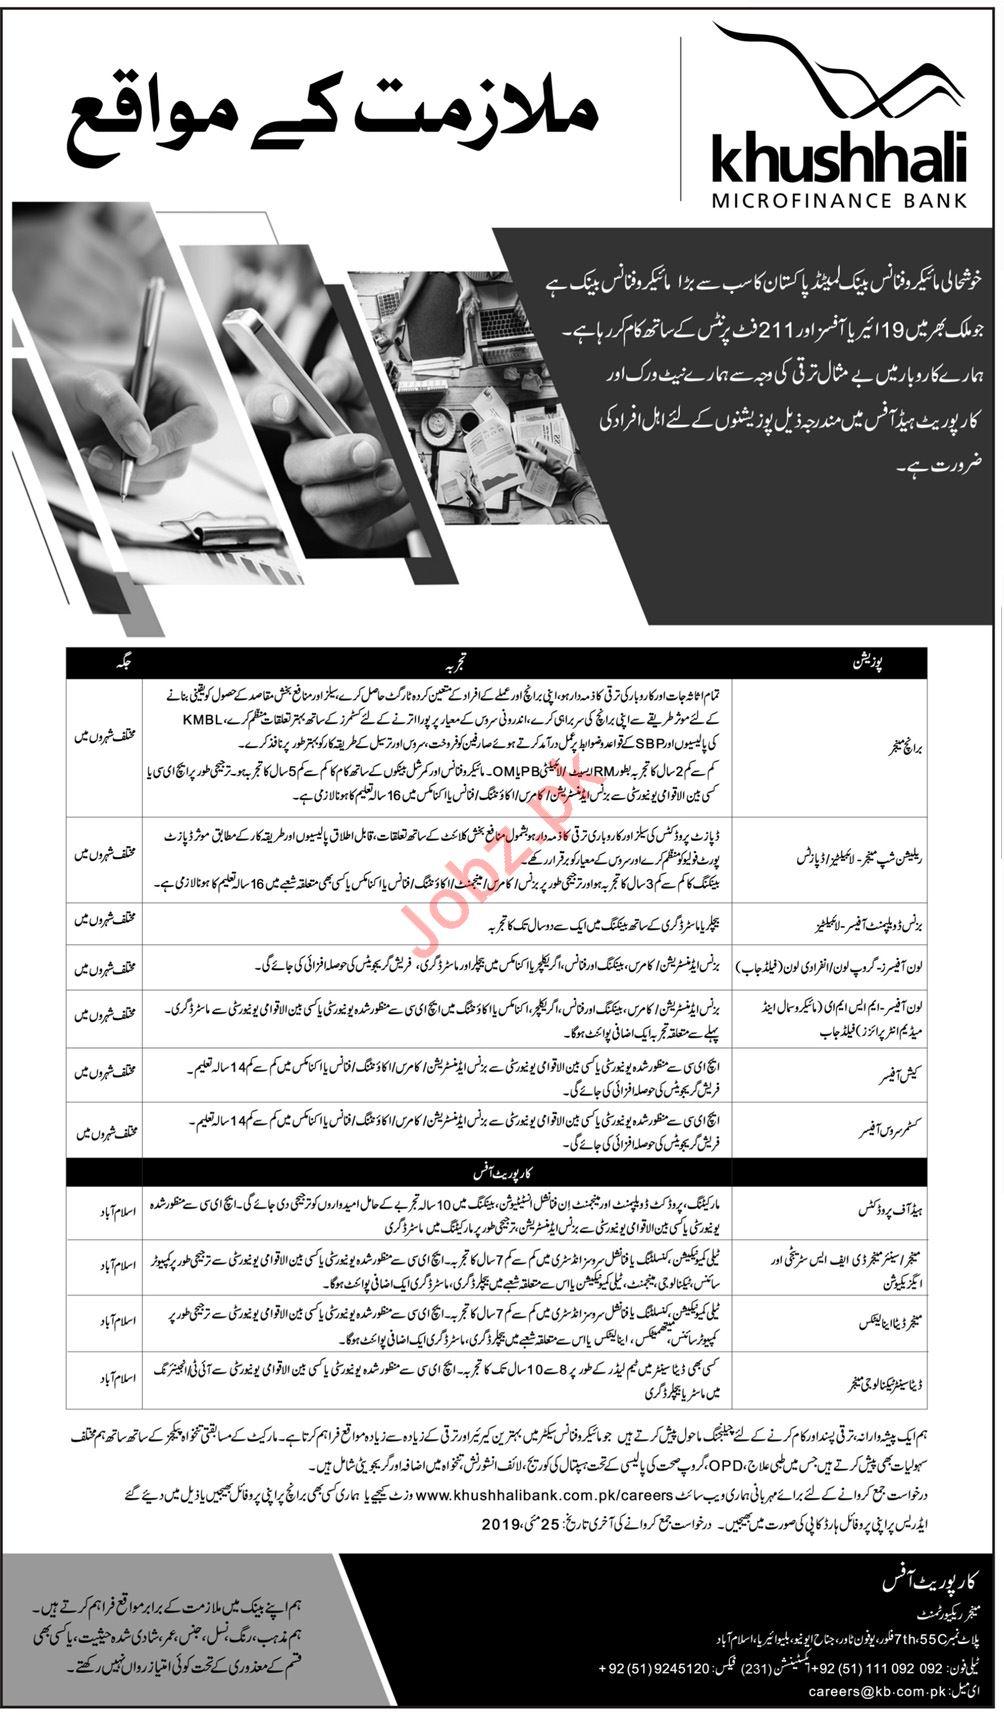 Khushhali MicroFinance Bank Limited Jobs 2019